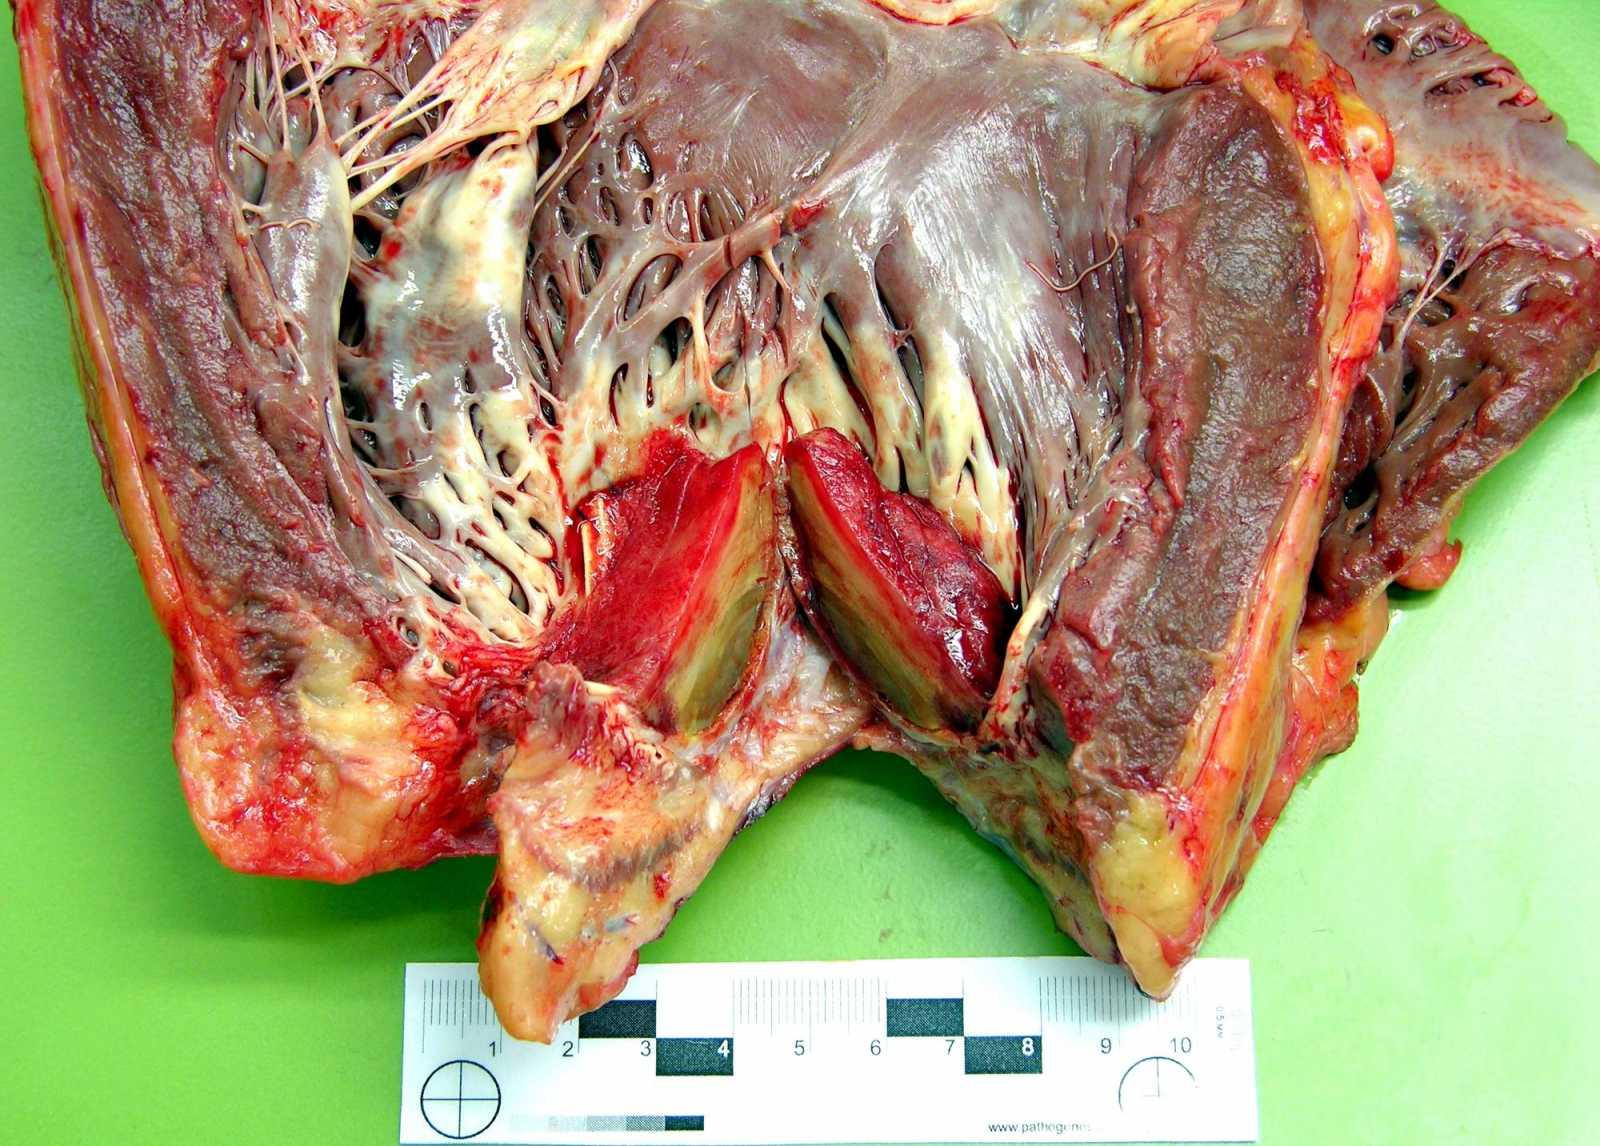 Пристеночный тромб левого желудочка сердца (на разрезе)